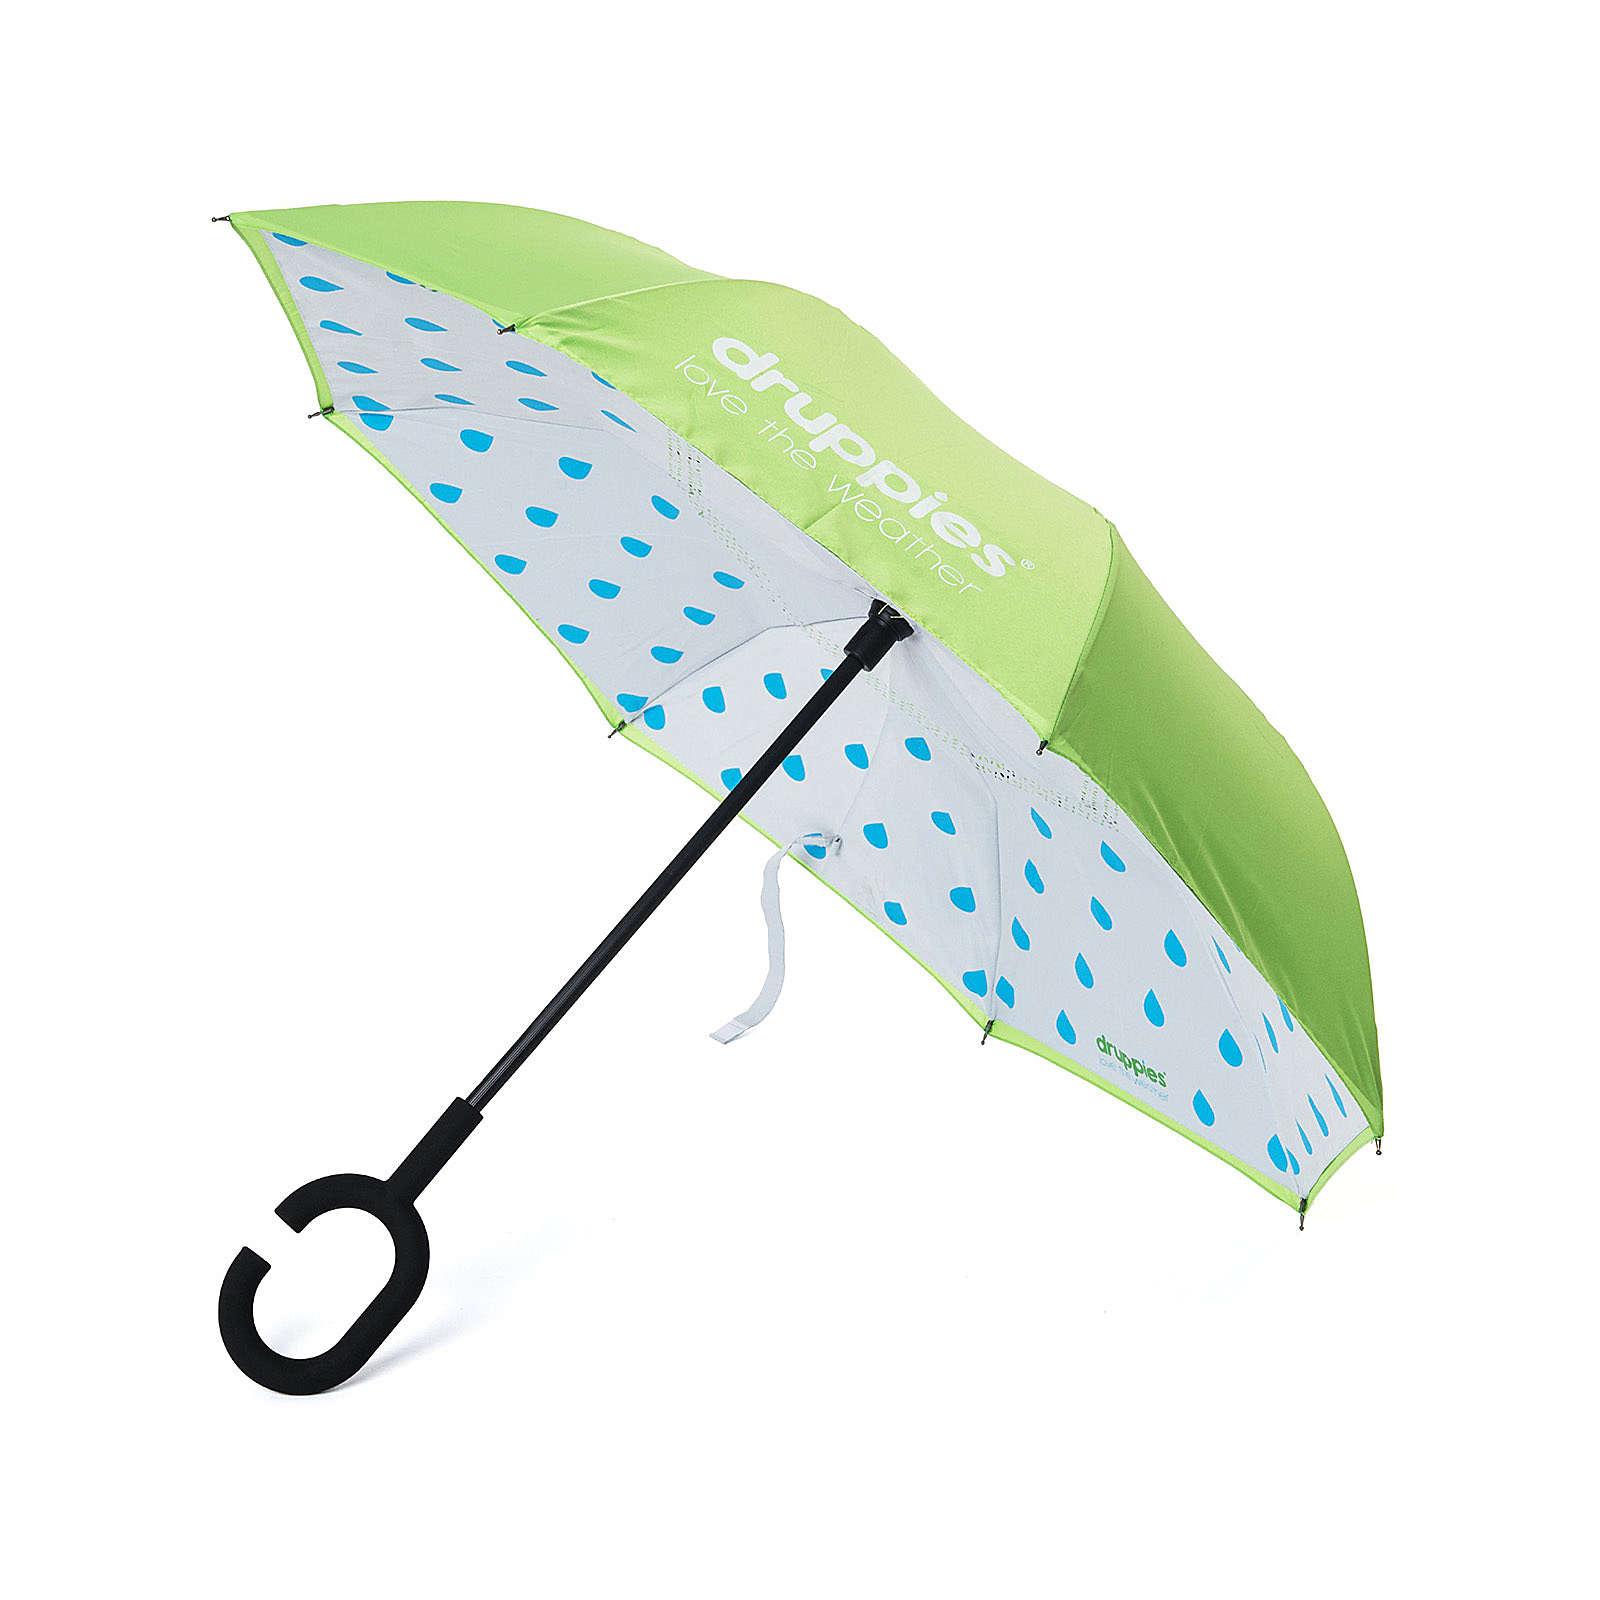 druppies ® Regenschirm  Regenschirm Regenschirme für Kinder grün Gr. one size